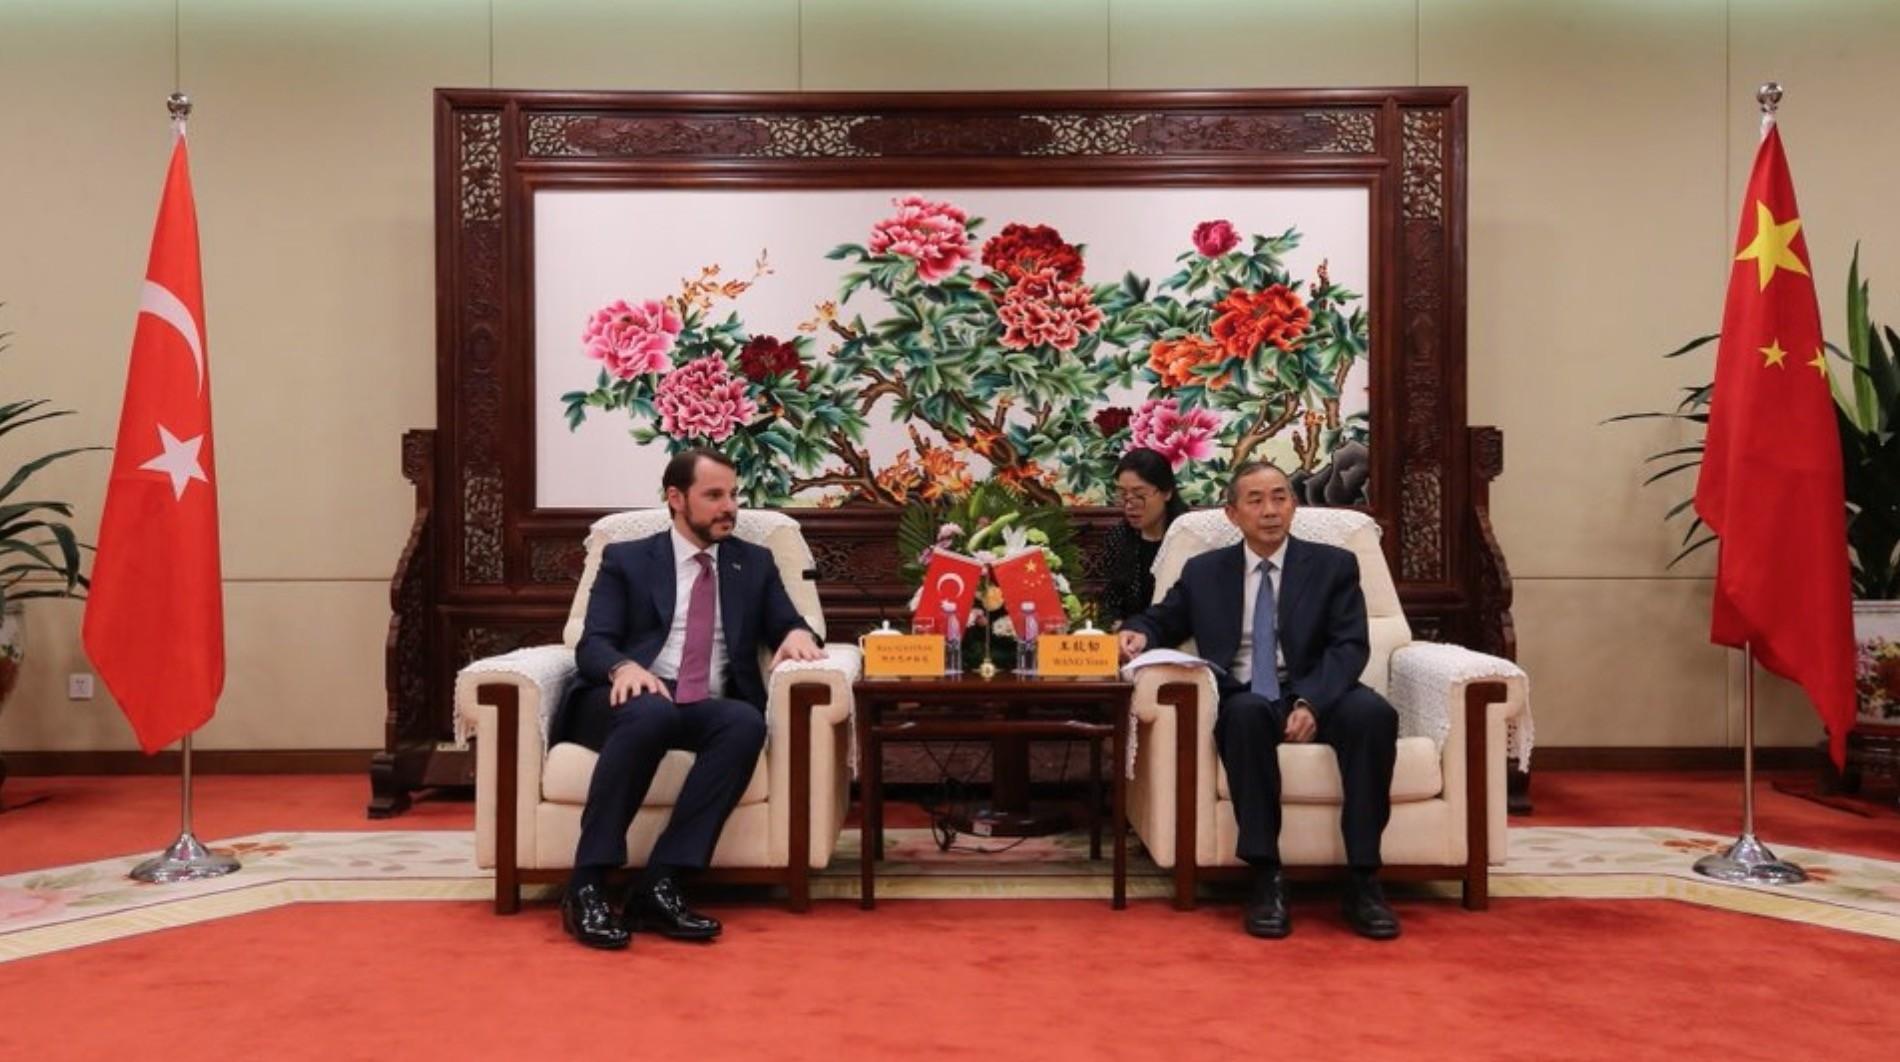 Energy Minister Berat Albayrak (L) with Chinese Atomic Energy Authority (CAEA) Vice Chairman Wang Yiren (R) in Beijing, China, May 3.